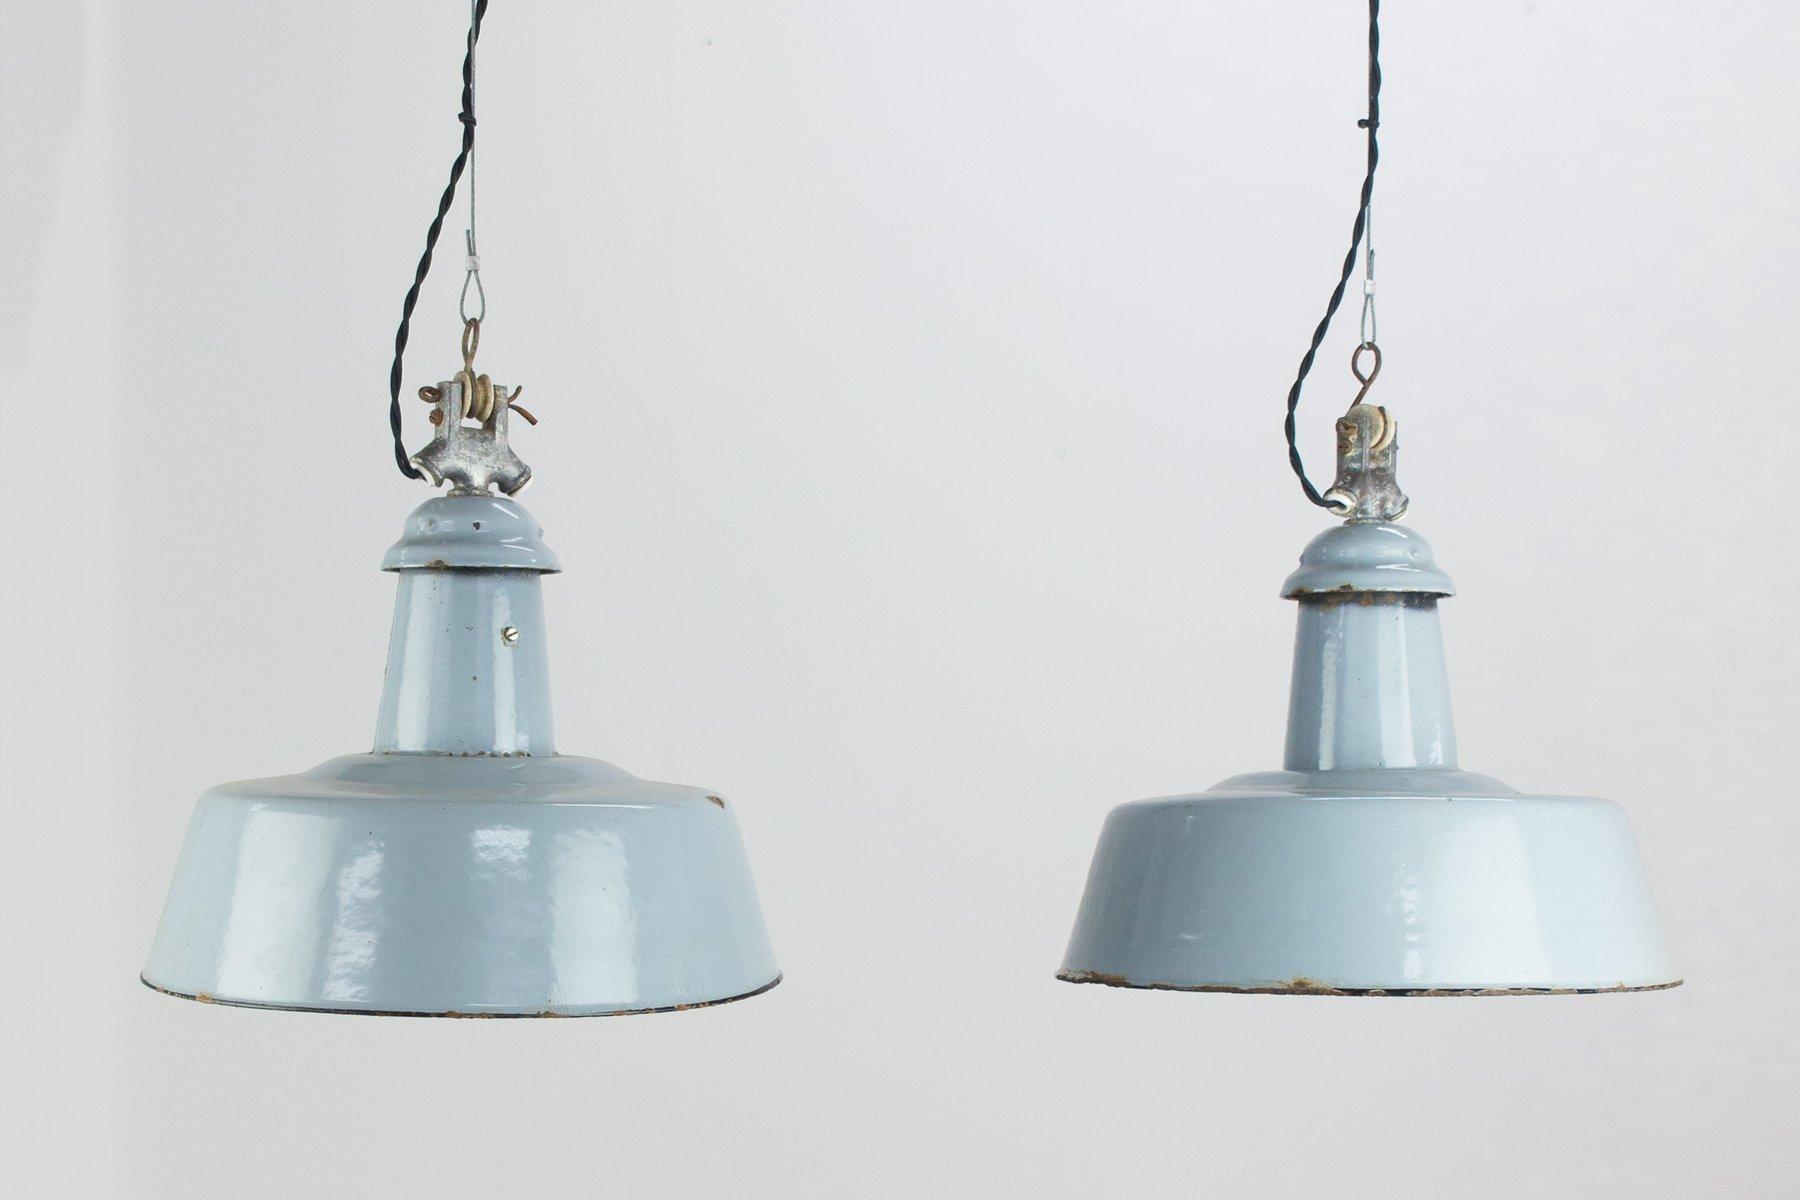 Industrielle vintage Emaille Hängelampen in Blau, 2er Set